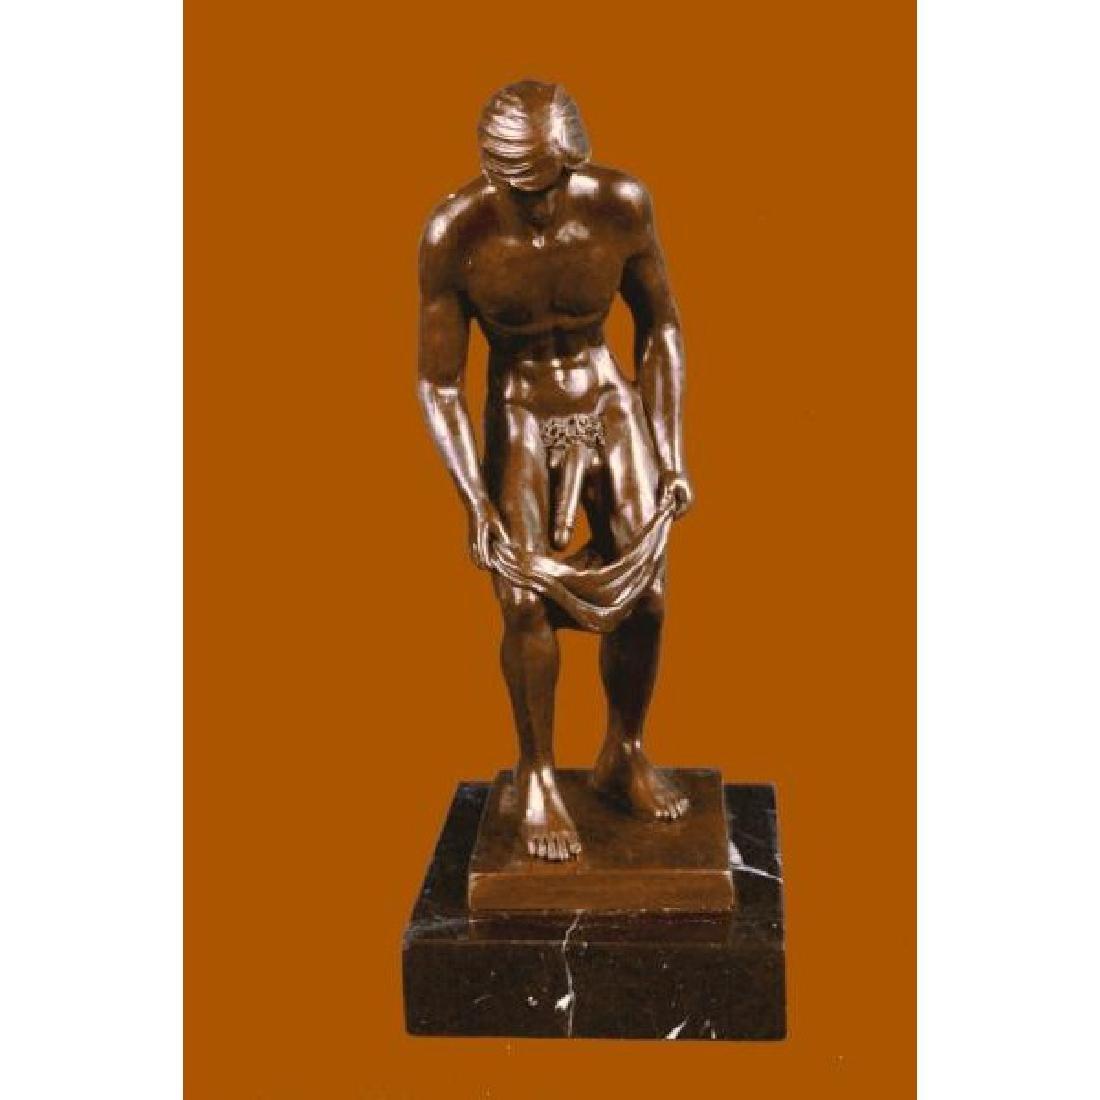 Collector Edition Nude Male Sculpture Men Statue Bronze